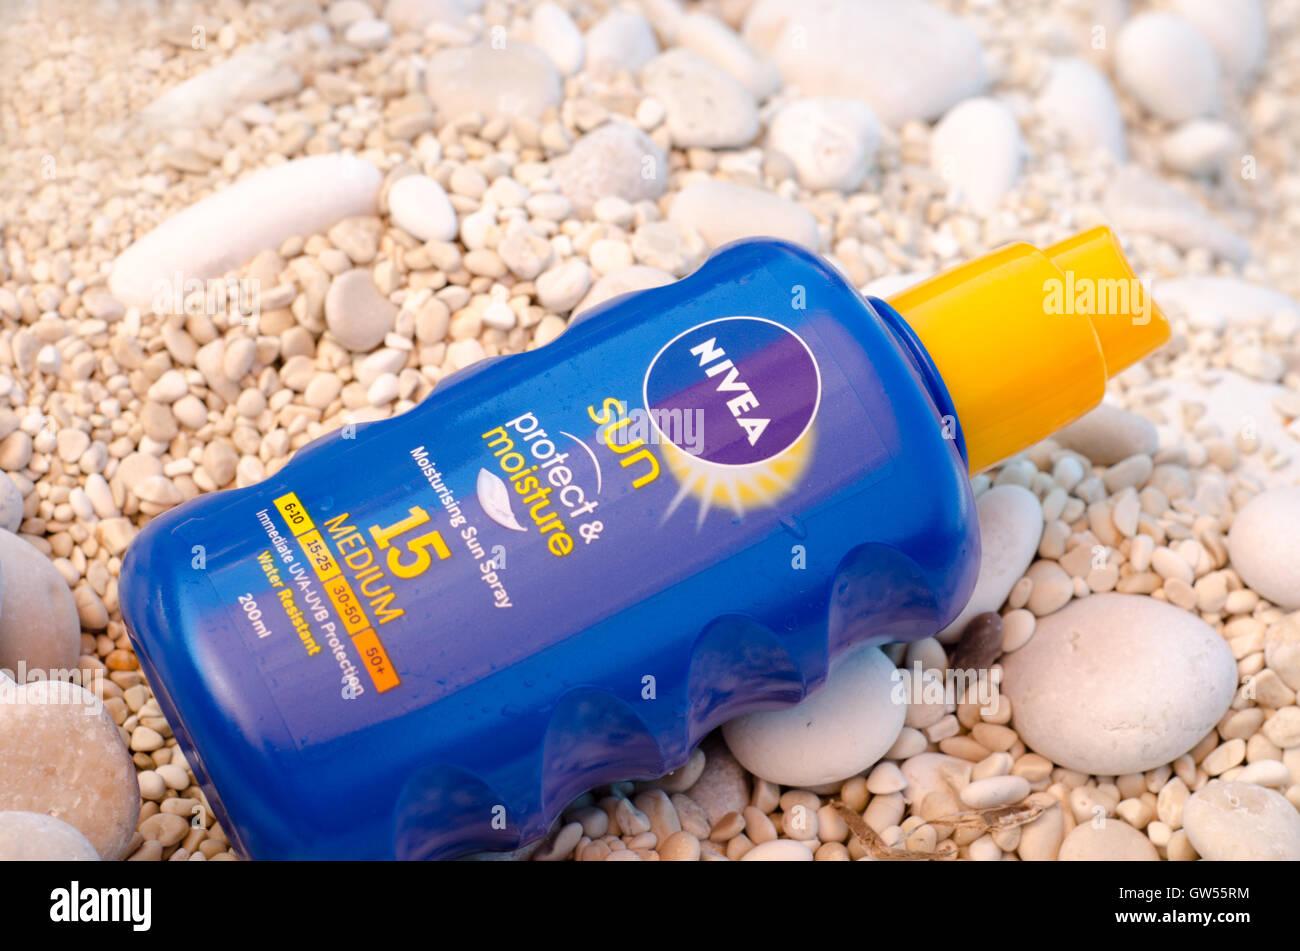 Nivea Suncream on pebble beach - Stock Image